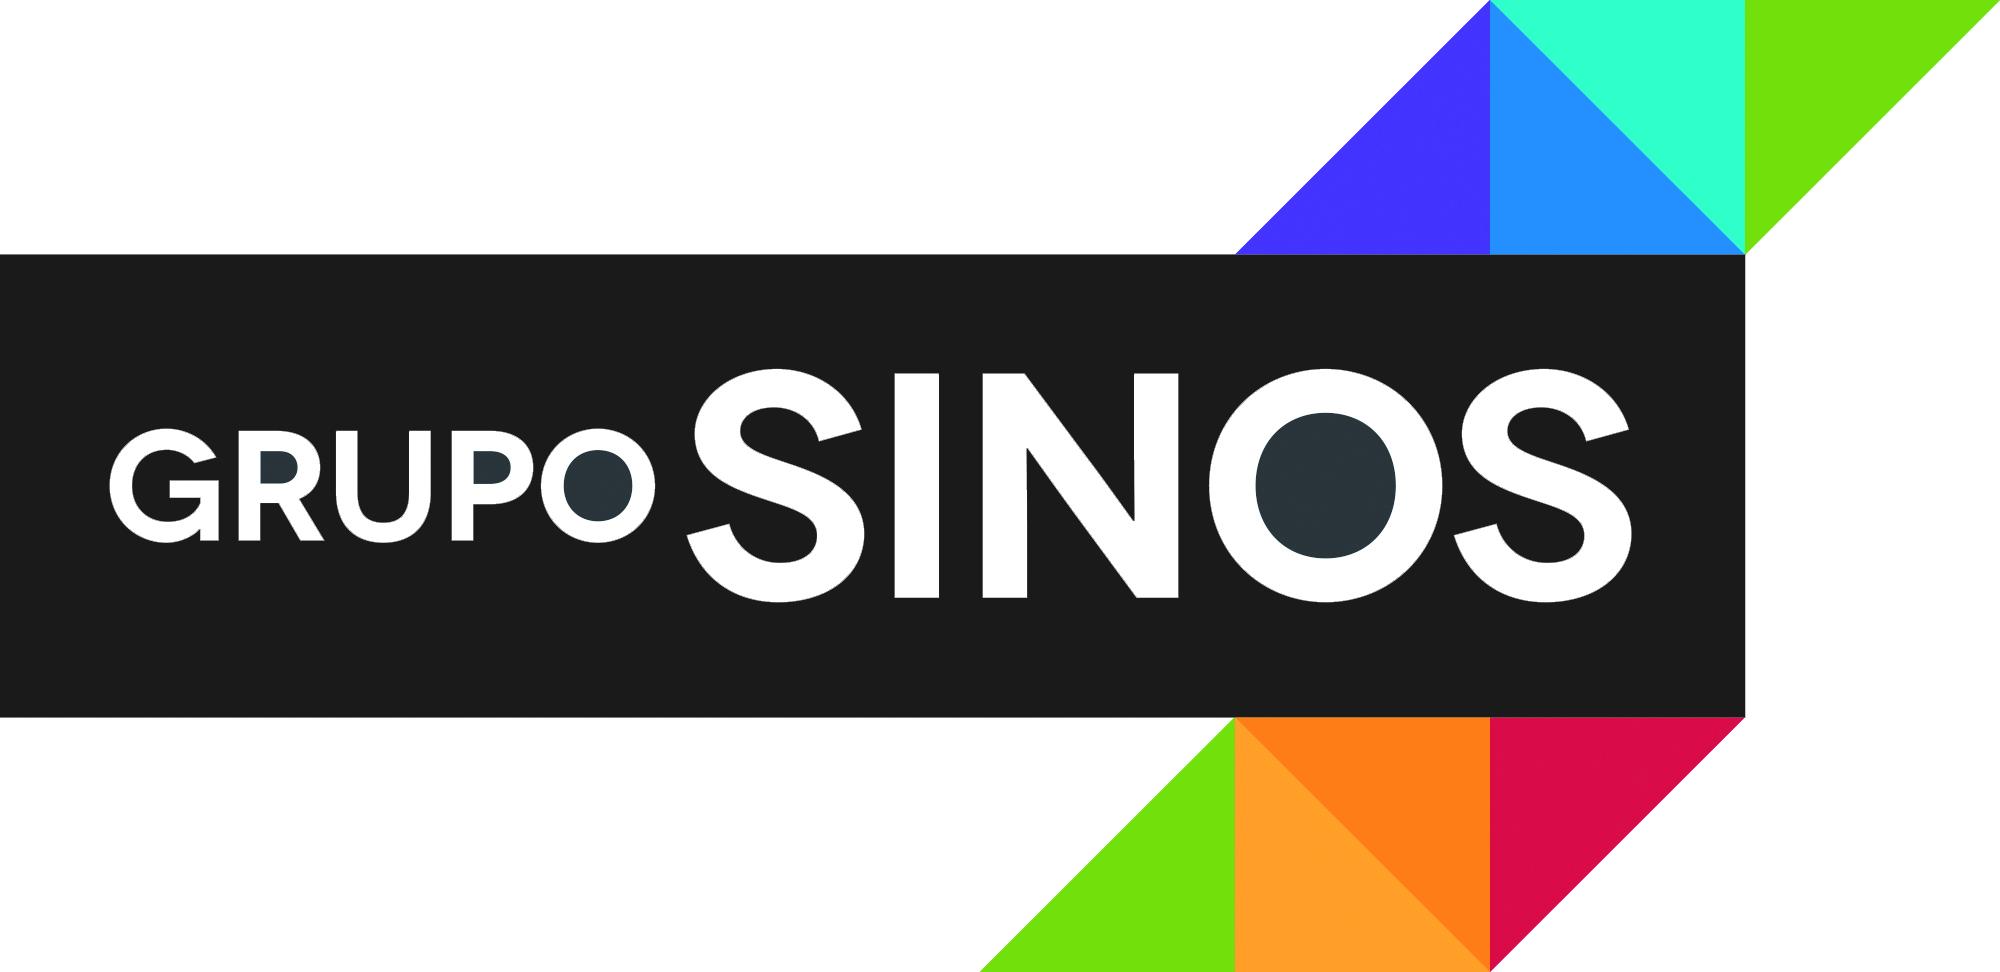 Grupo Sinos logo